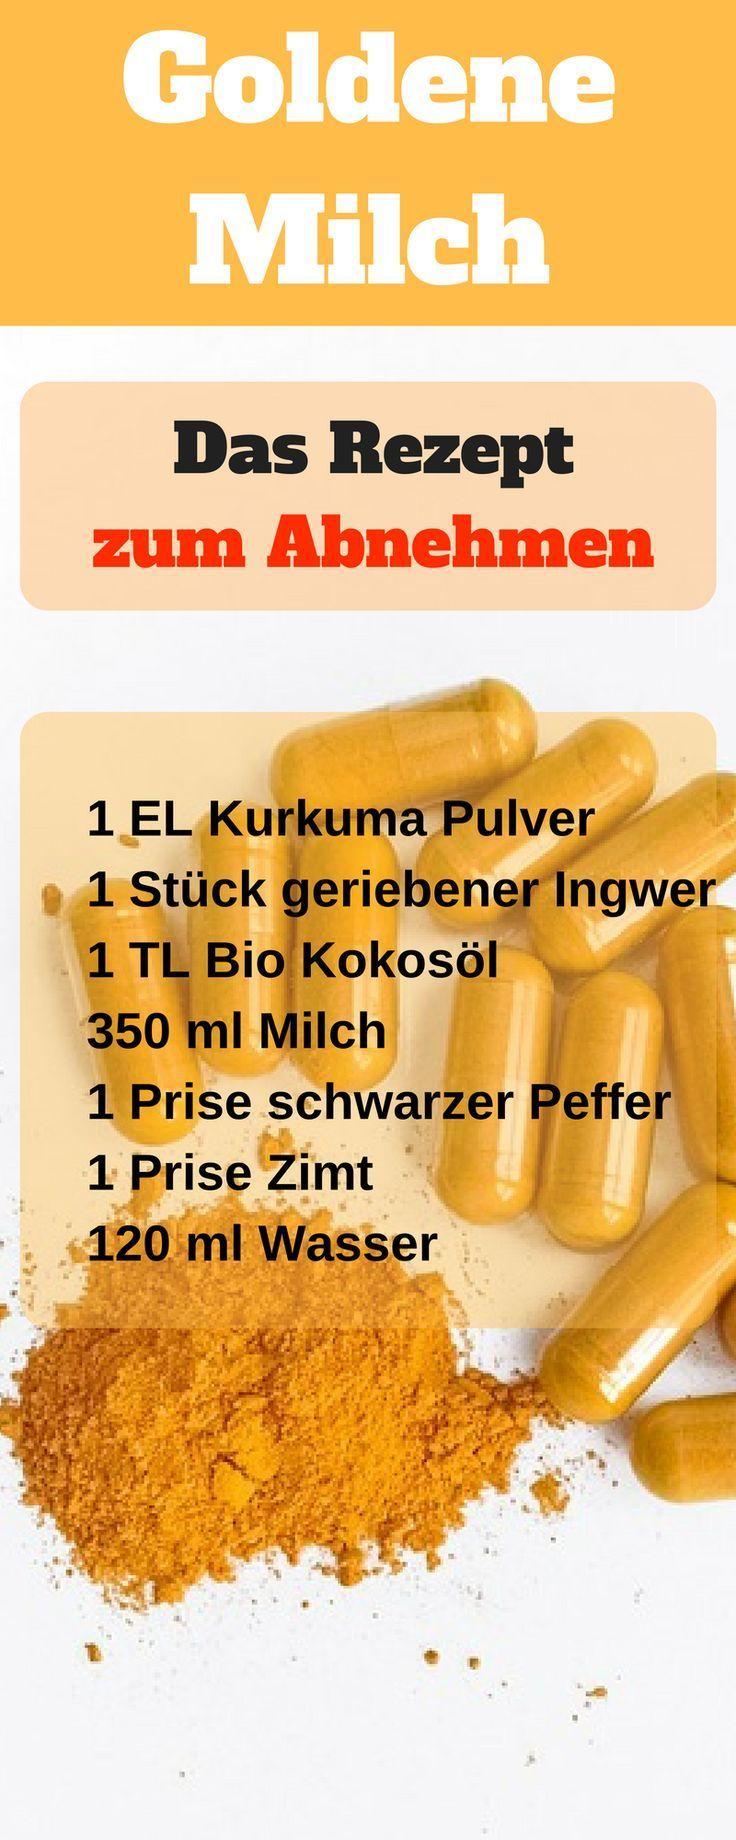 Golden milk recipe. Slimming golden milk, you want to lose weight with golden milk ...   - Schnell a...